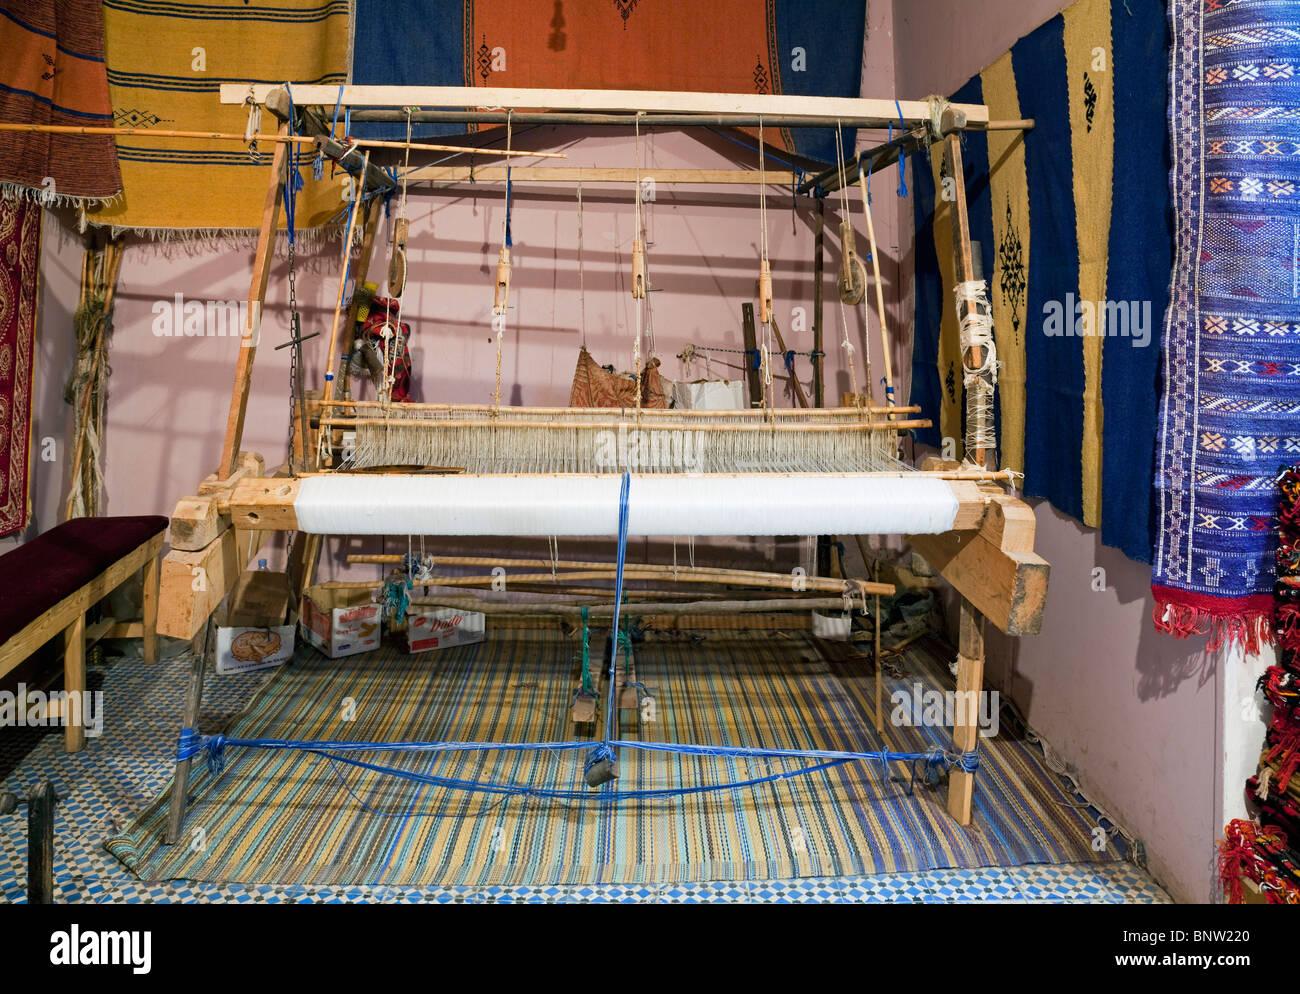 Weaving Shop Stock Photos & Weaving Shop Stock Images - Alamy